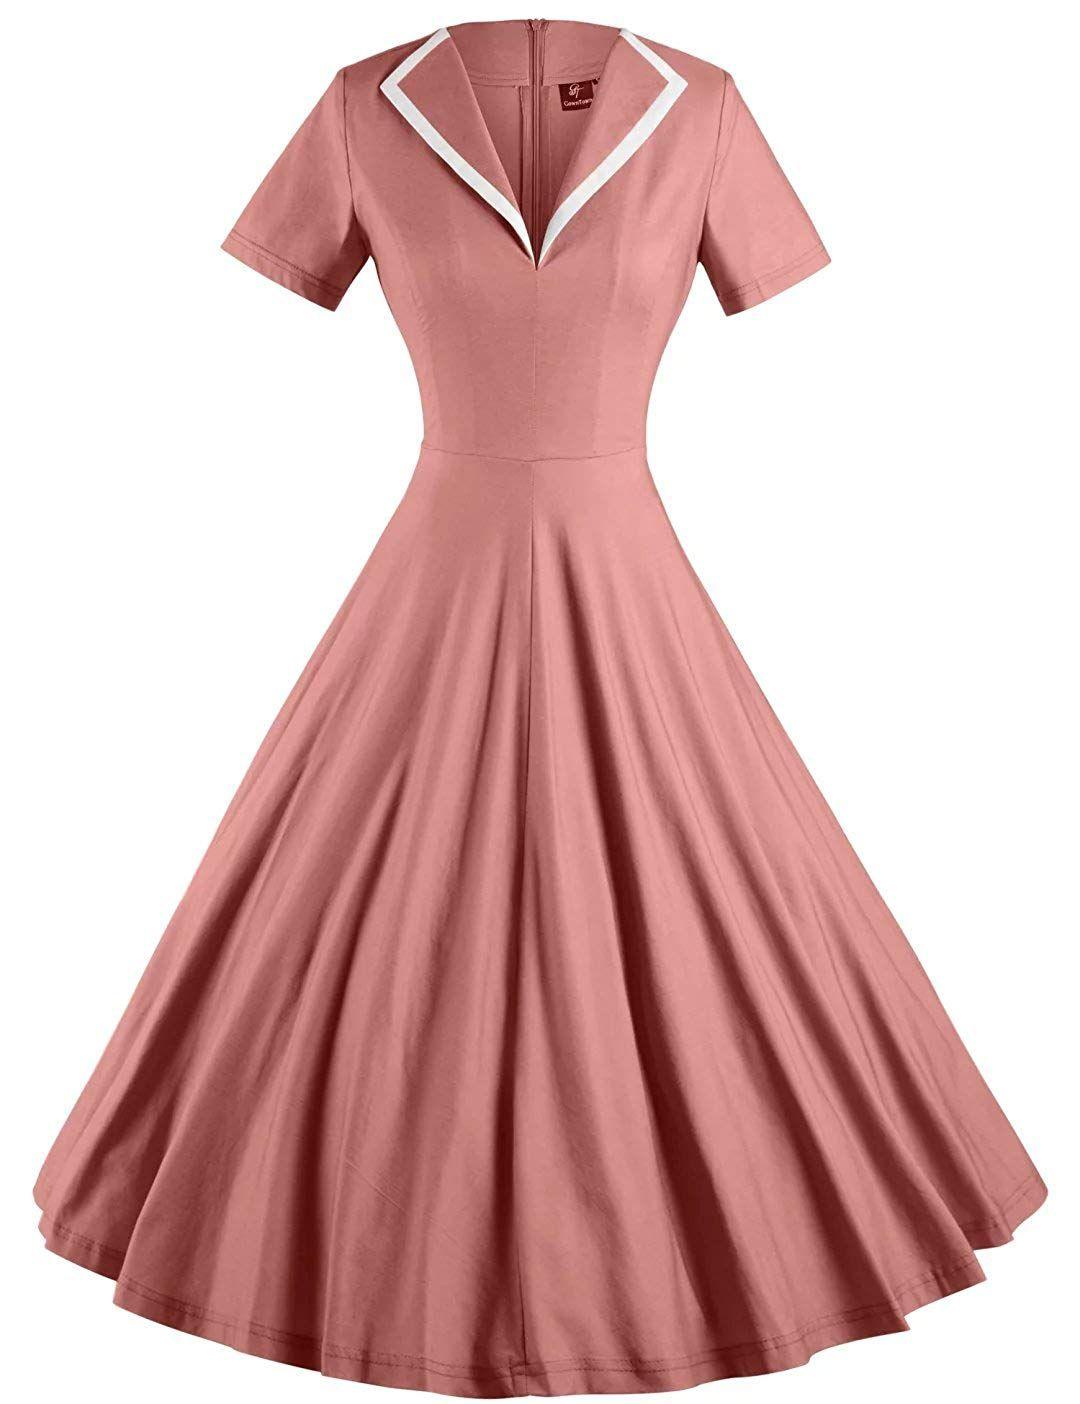 1950s Housewife Dress